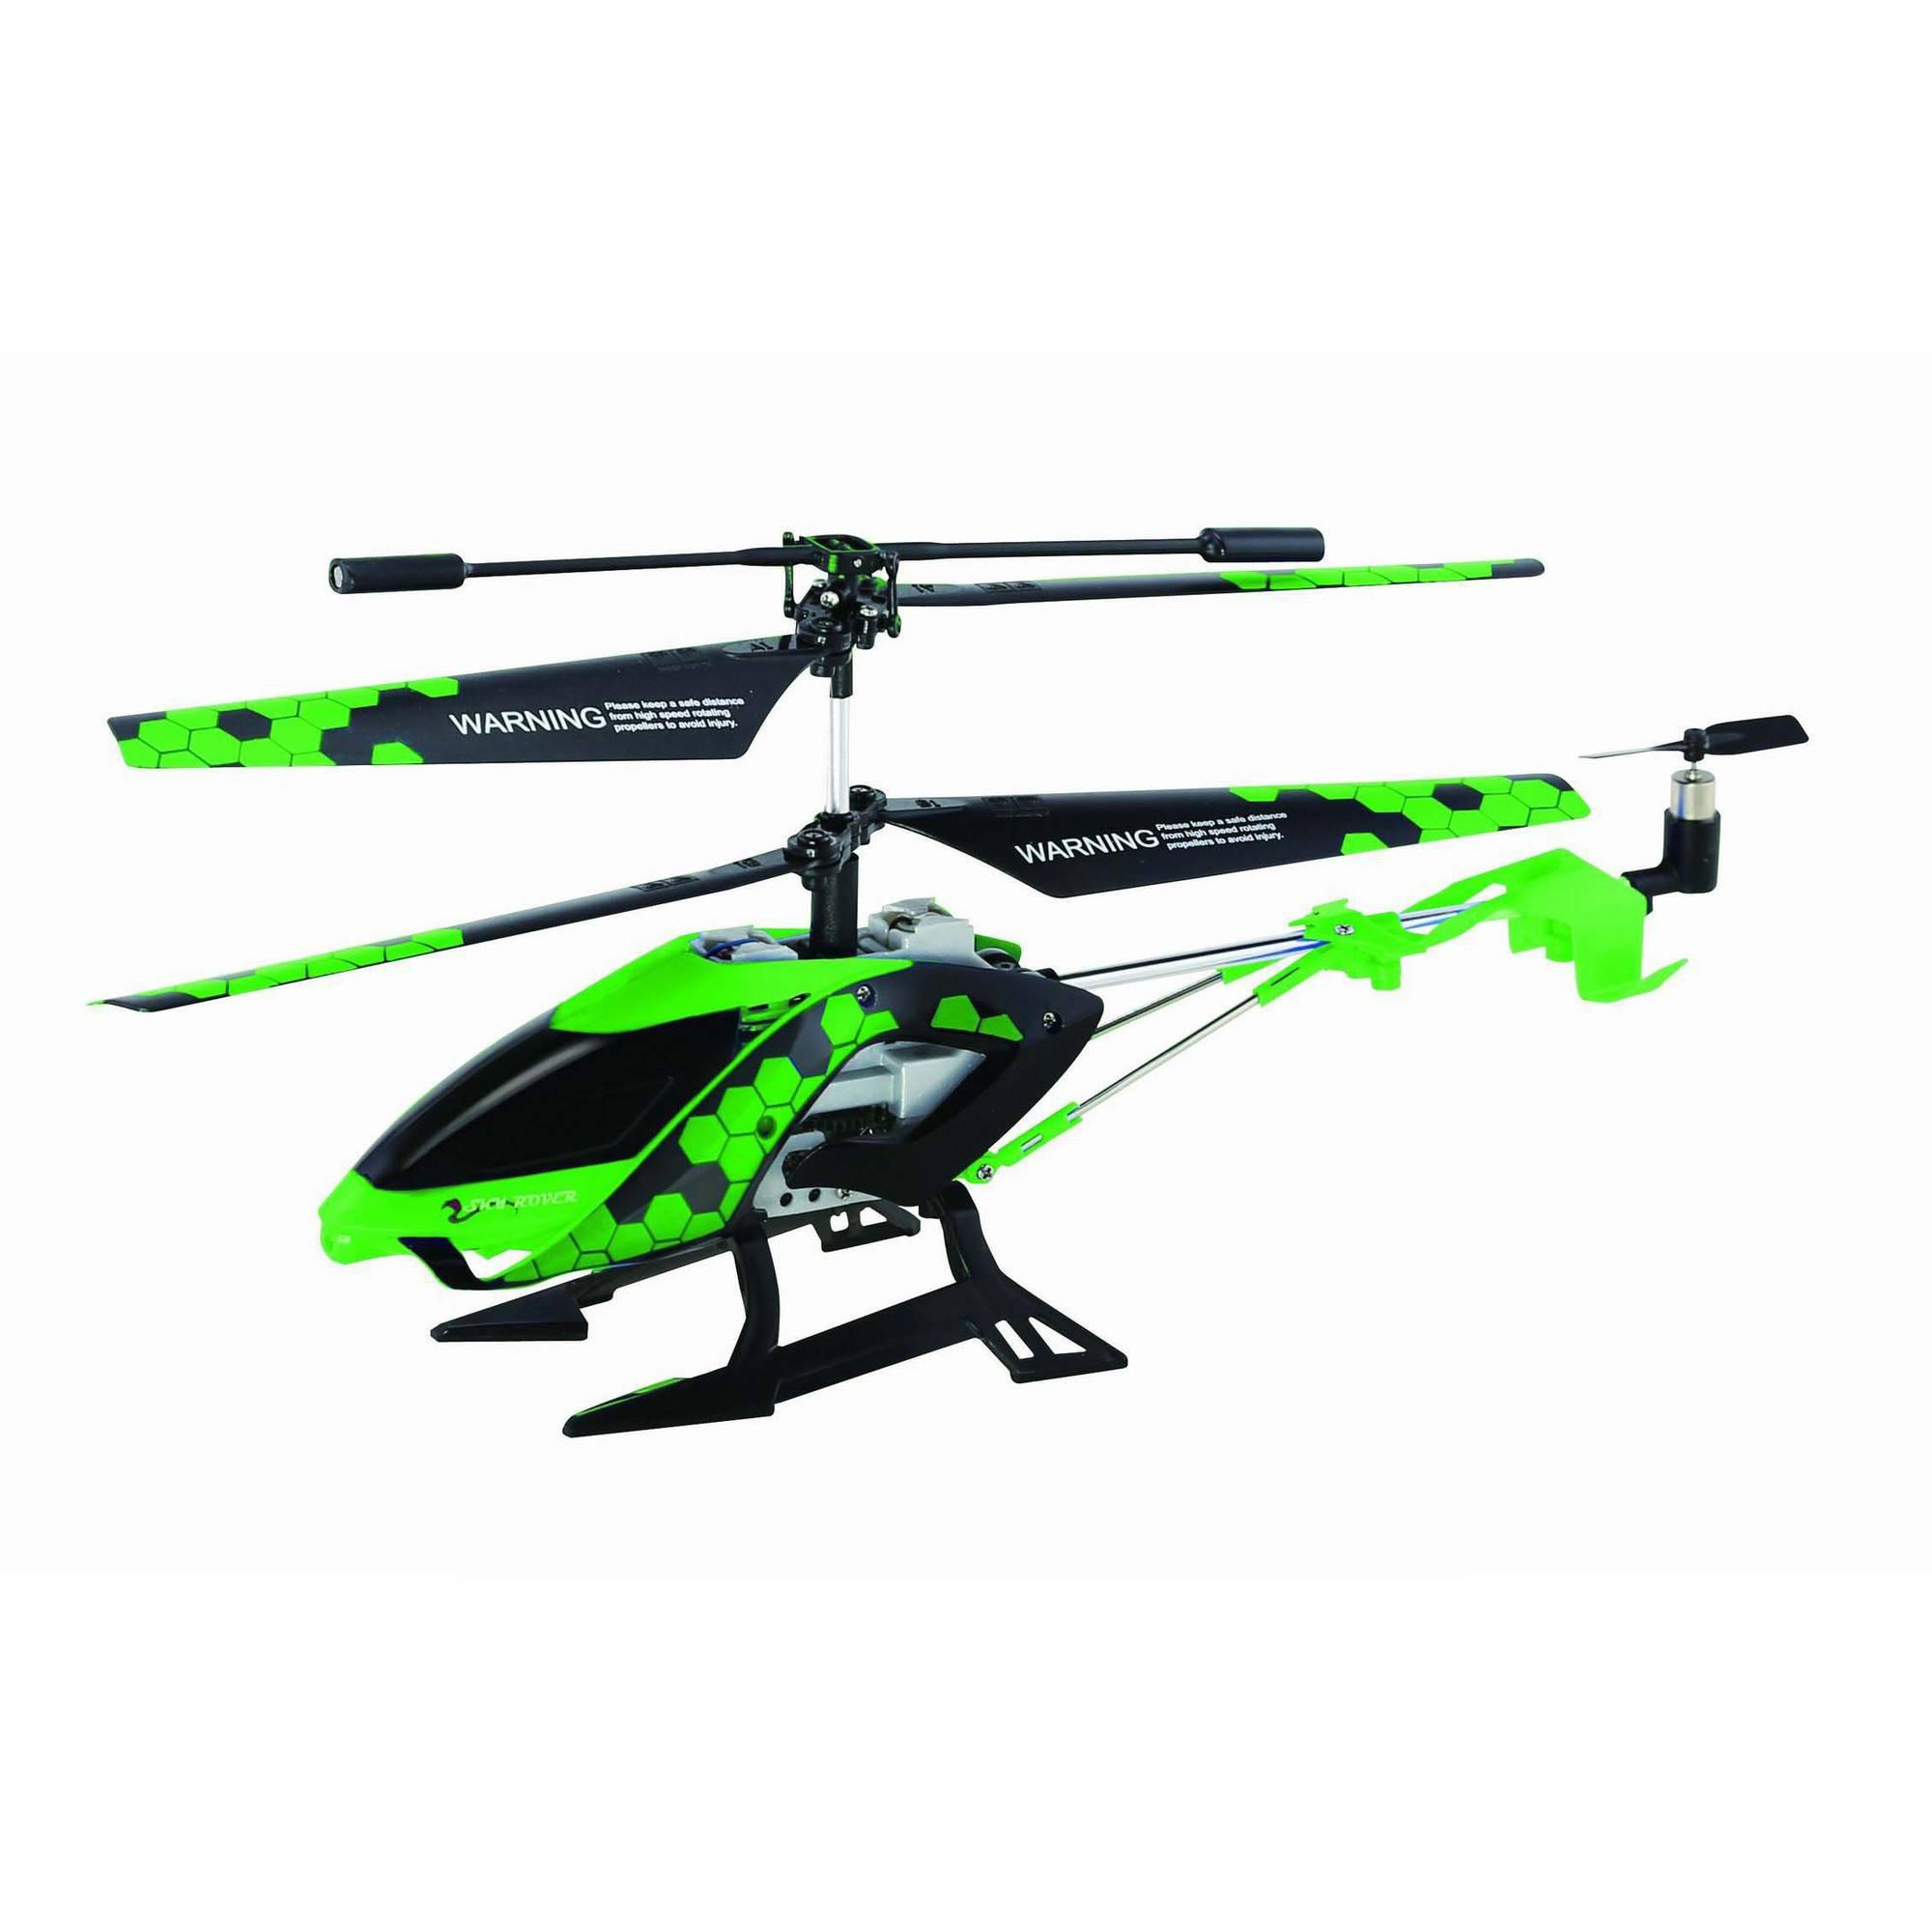 Stalker Auldey Sky Rover Indoor Helicopter, Green